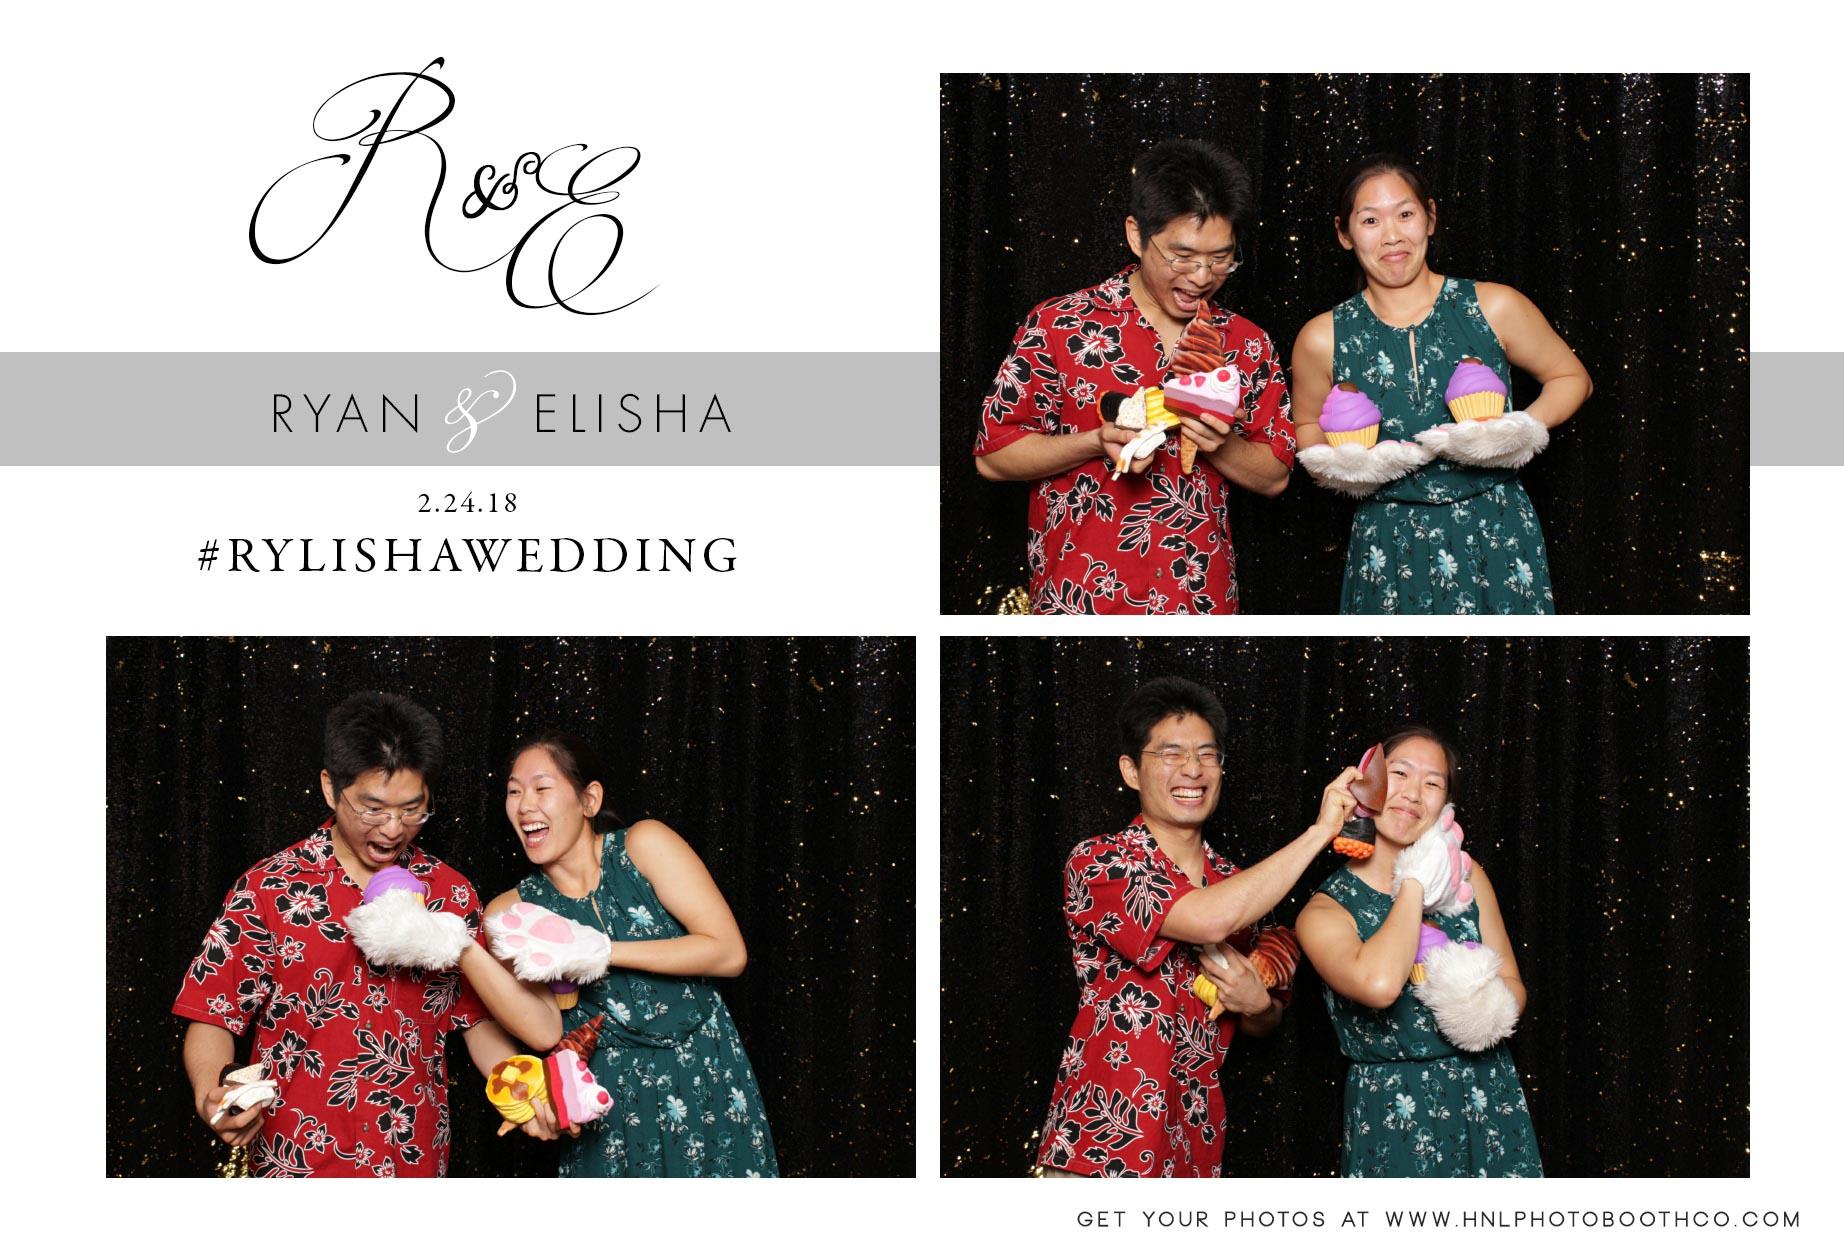 Ryan and Elisha Wedding Hale Koa Hotel Oahu Honolulu Hawaii (26 of 57).jpg